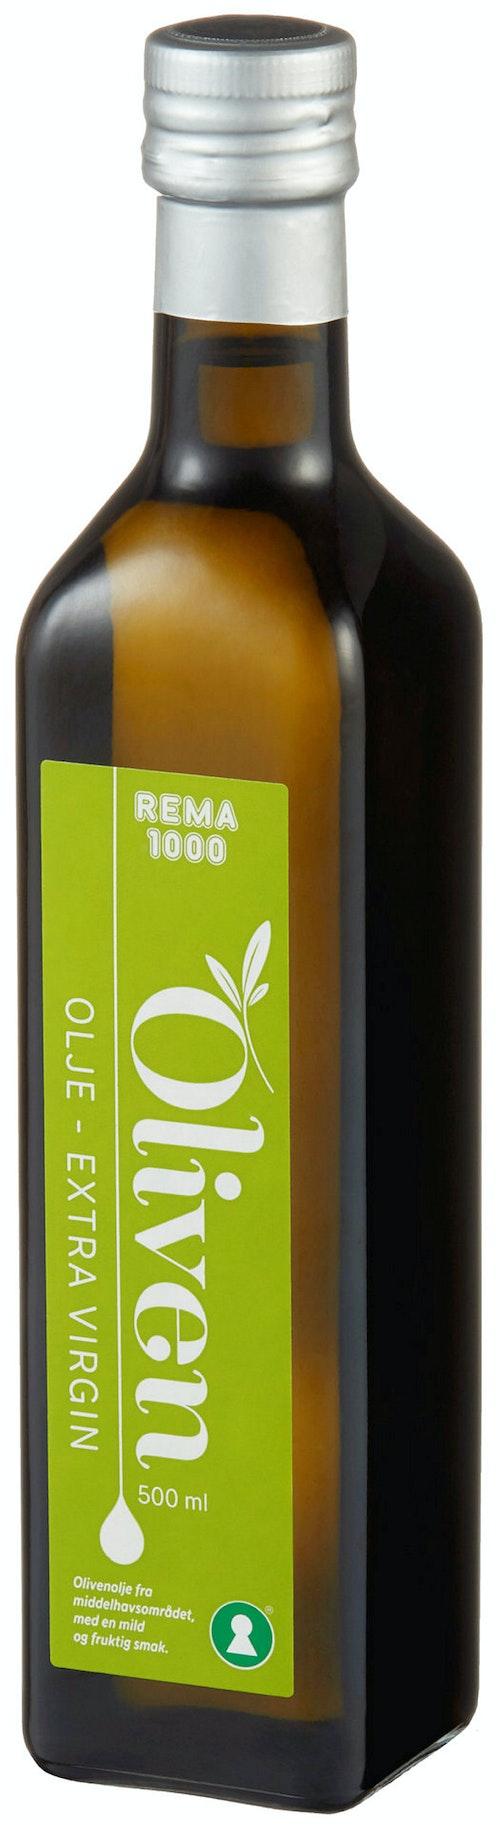 REMA 1000 Olivenolje Extra Virgin 0,5 l